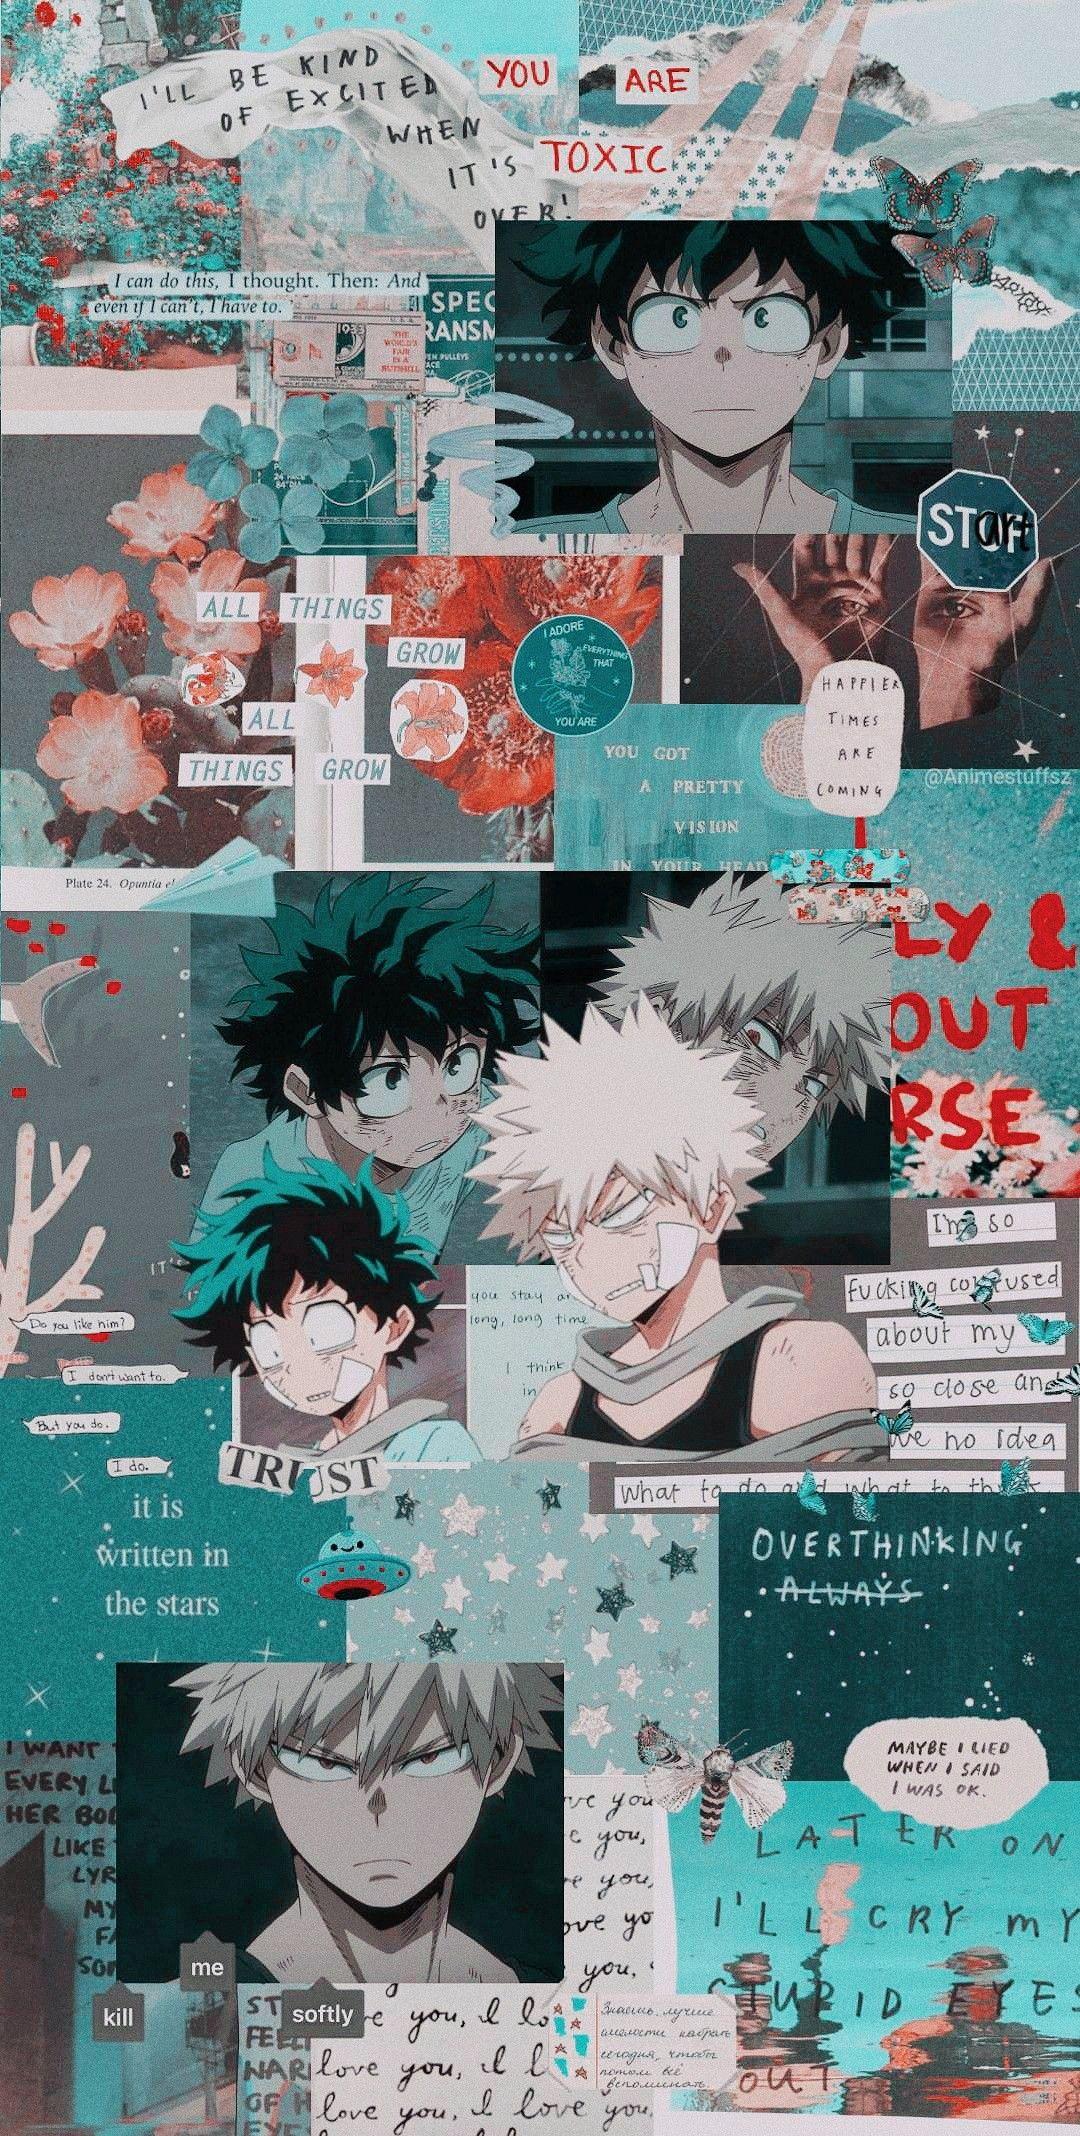 Boku No Hero Academia Anime Wallpaper Iphone Anime Wallpaper Phone Cute Anime Wallpaper